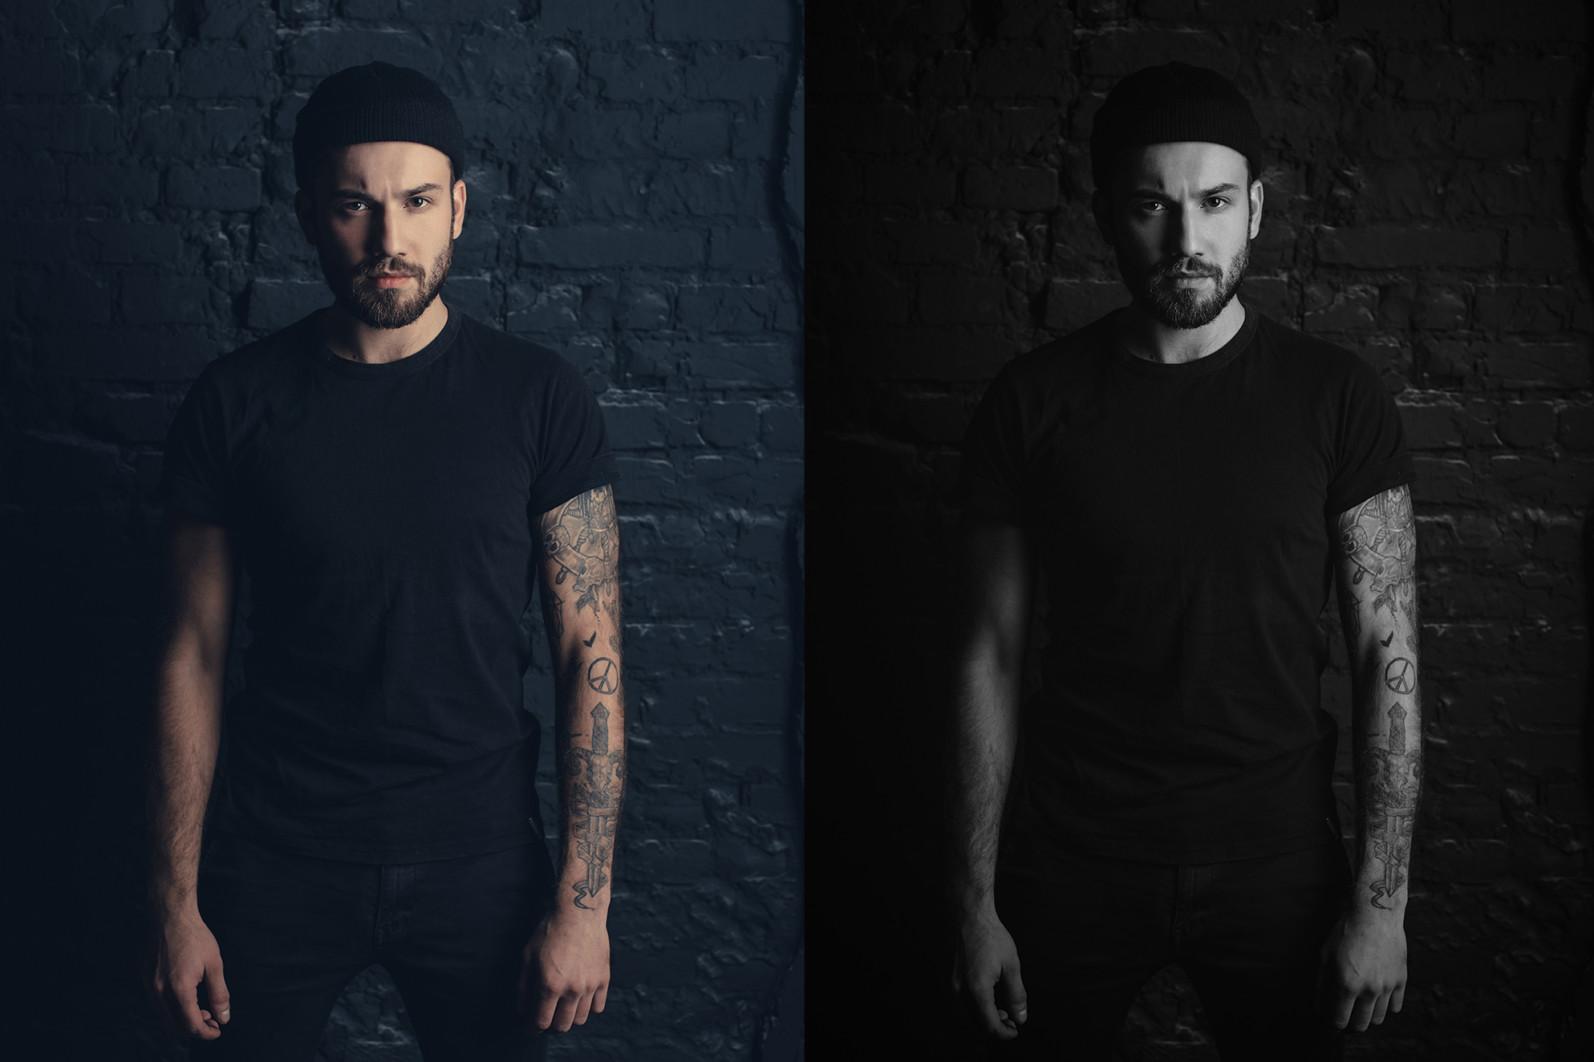 15 x Lightroom Presets, Monochrome Men Presets, Black and White Presets, Portrait Presets - 4 Monochrome Men 4 -